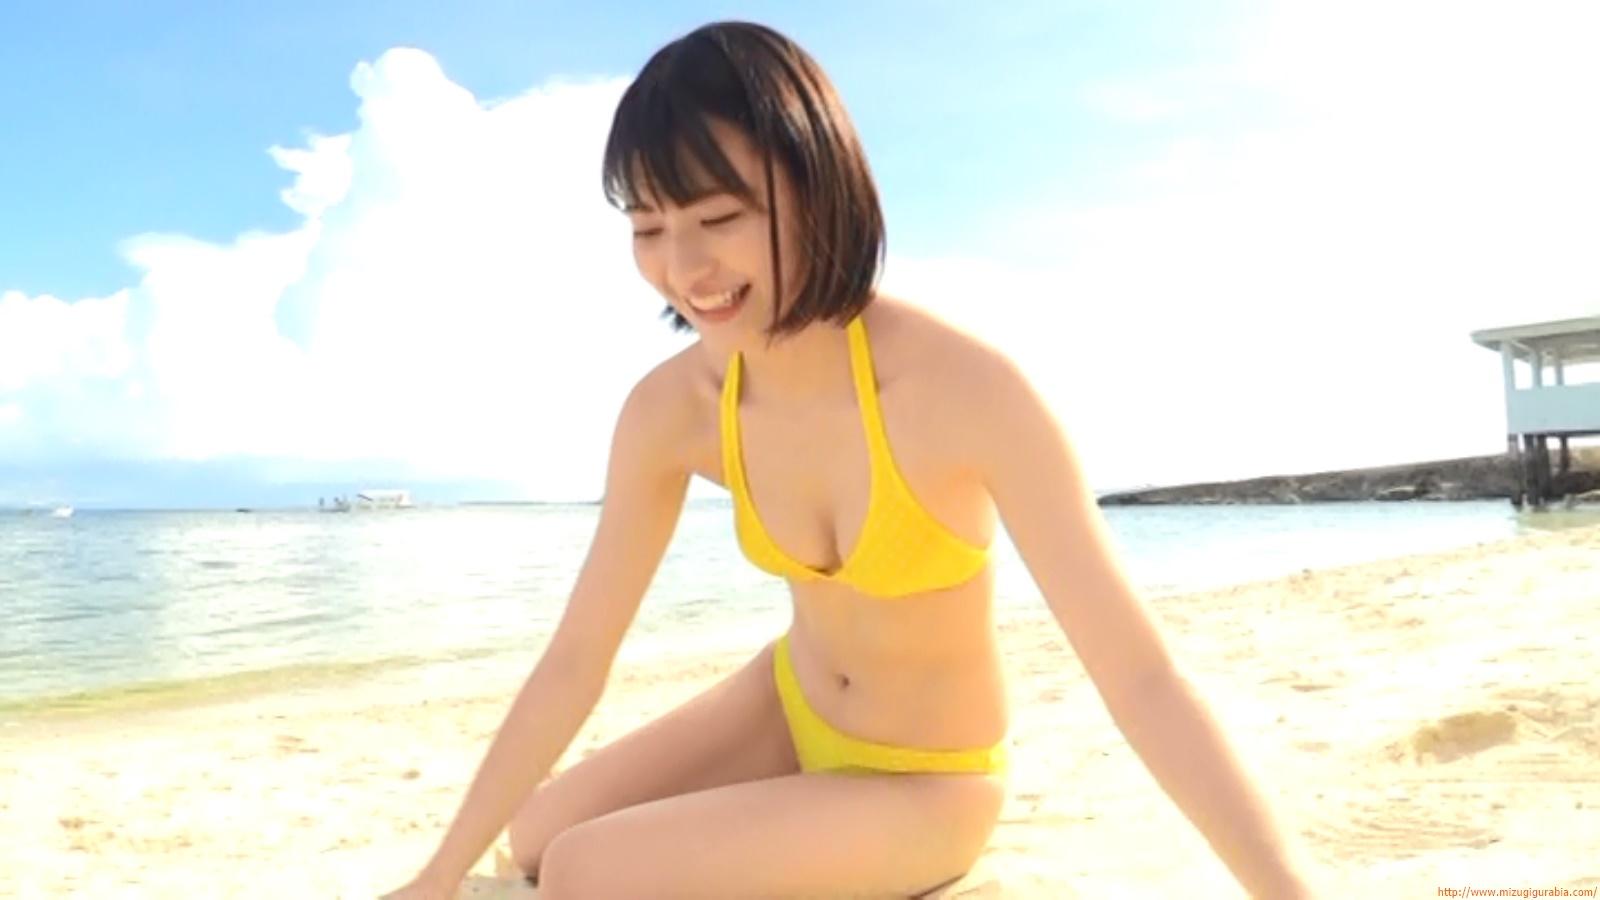 Beach dating256